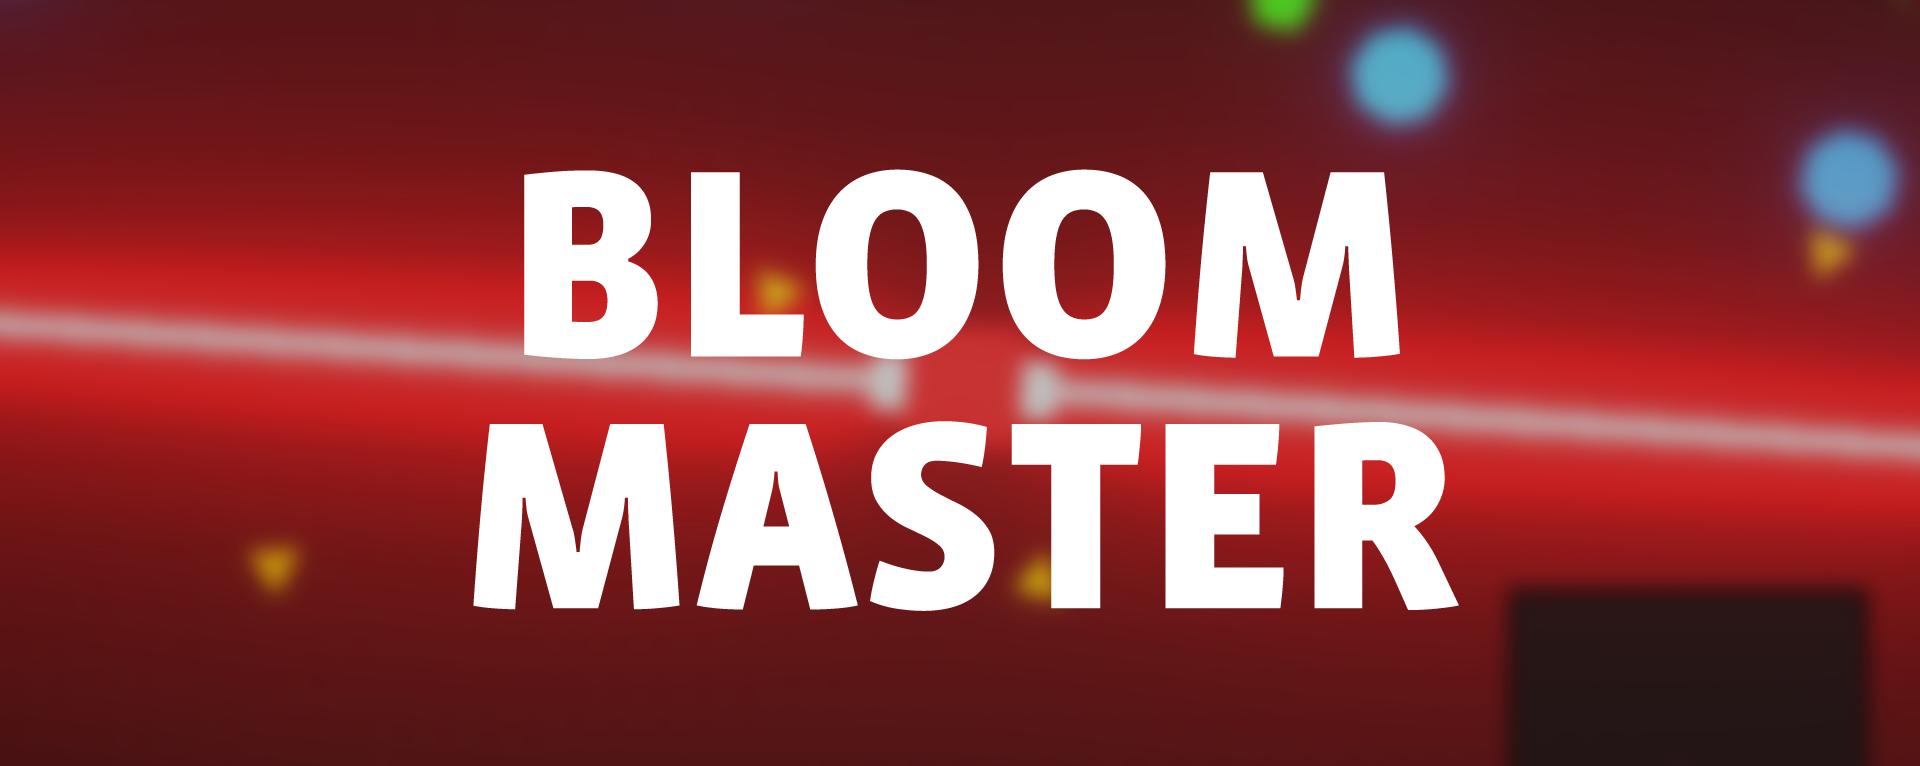 Bloom Master